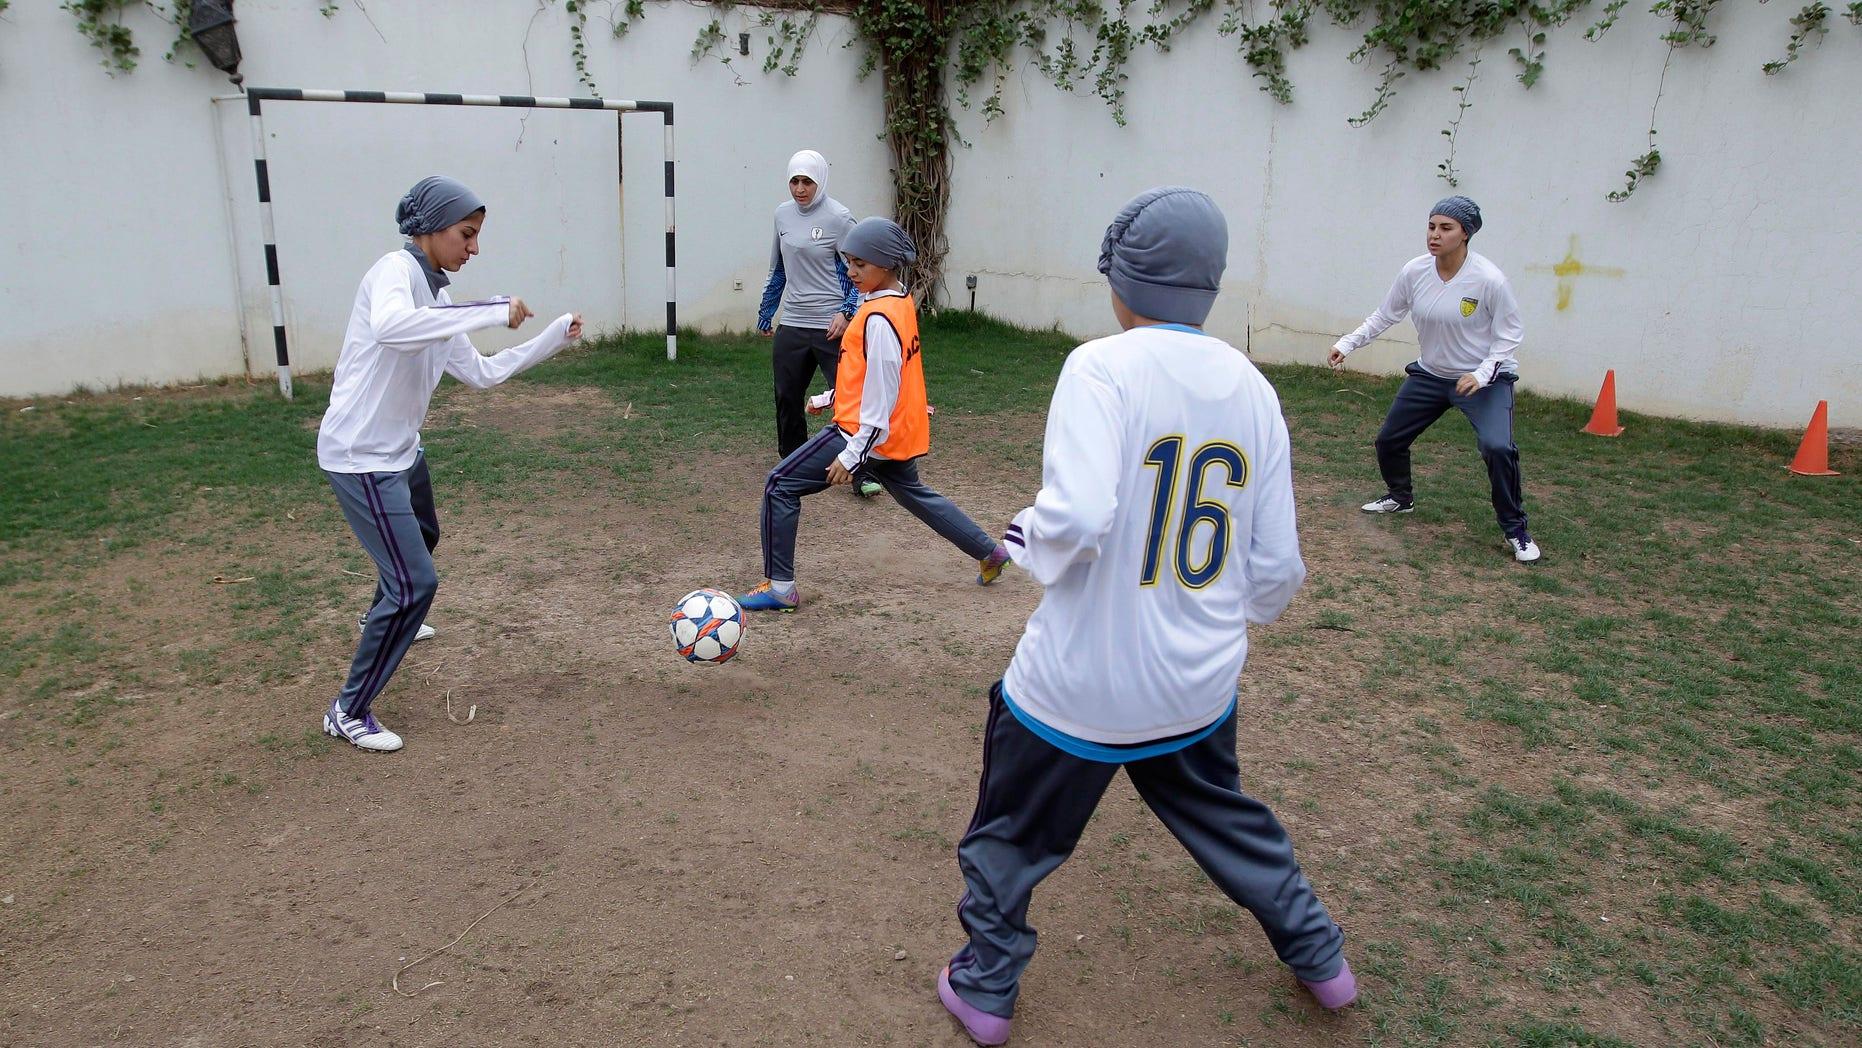 May 21, 2012: In this photo, members of a Saudi female soccer team practice at a secret location in Riyadh, Saudi Arabia.